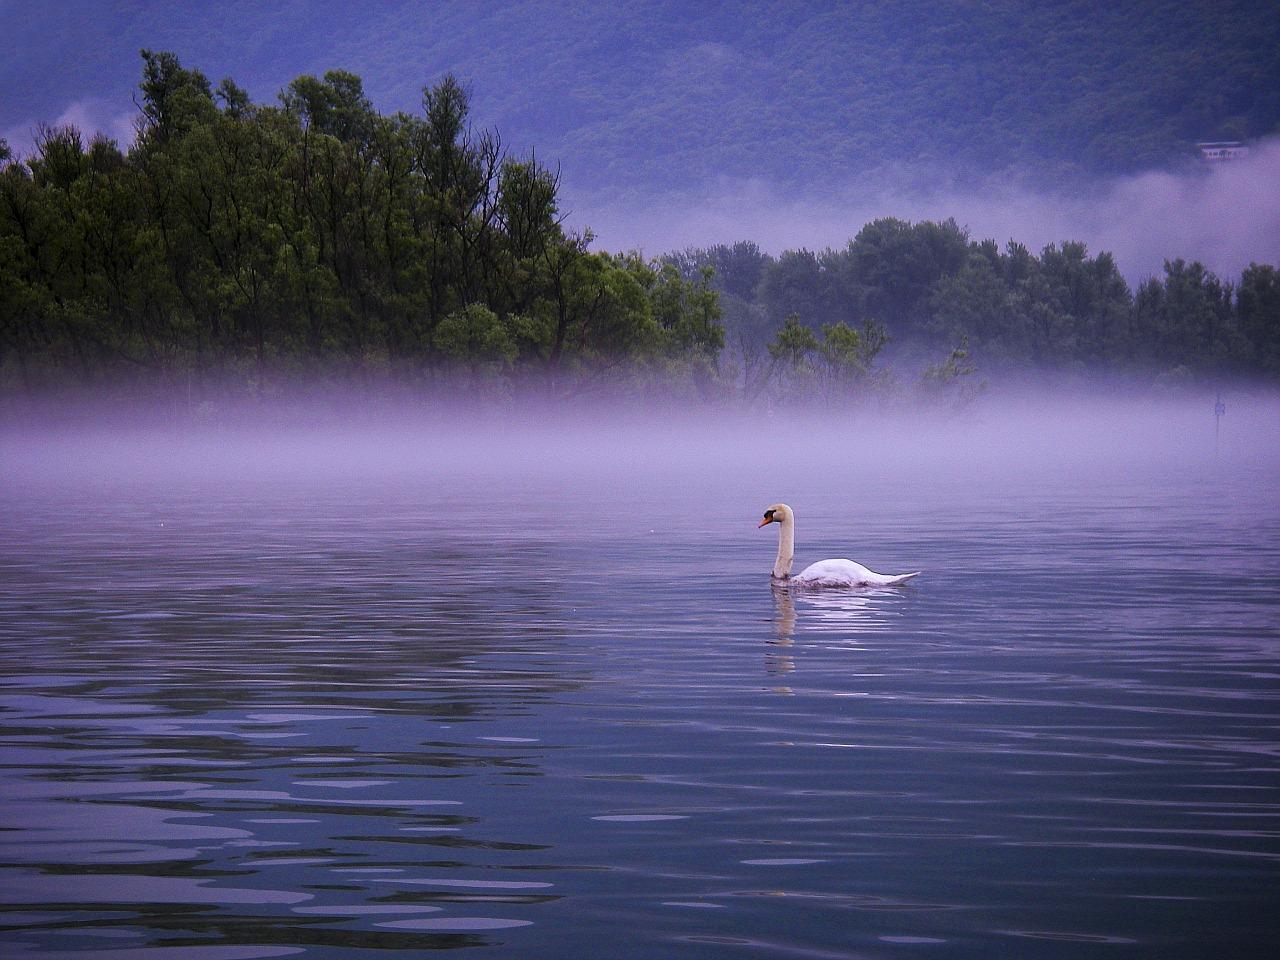 swan-752449_1280